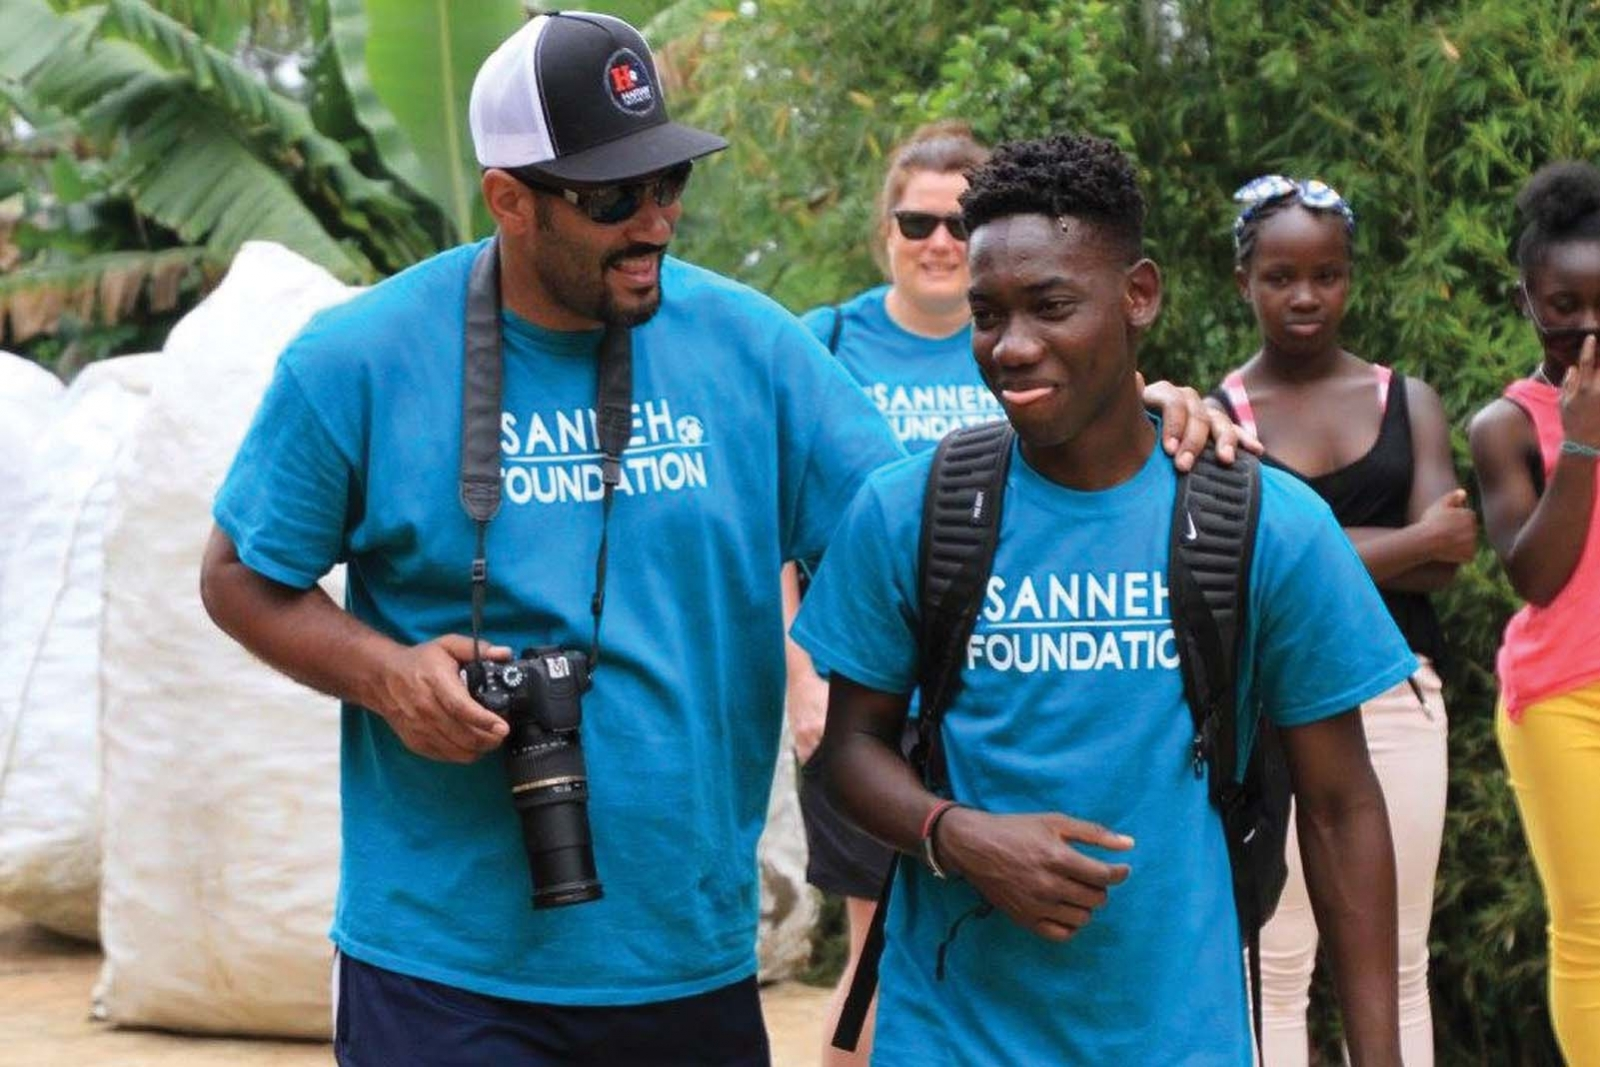 From left: Sanneh and Haitian Initiative participant Juan Louis.